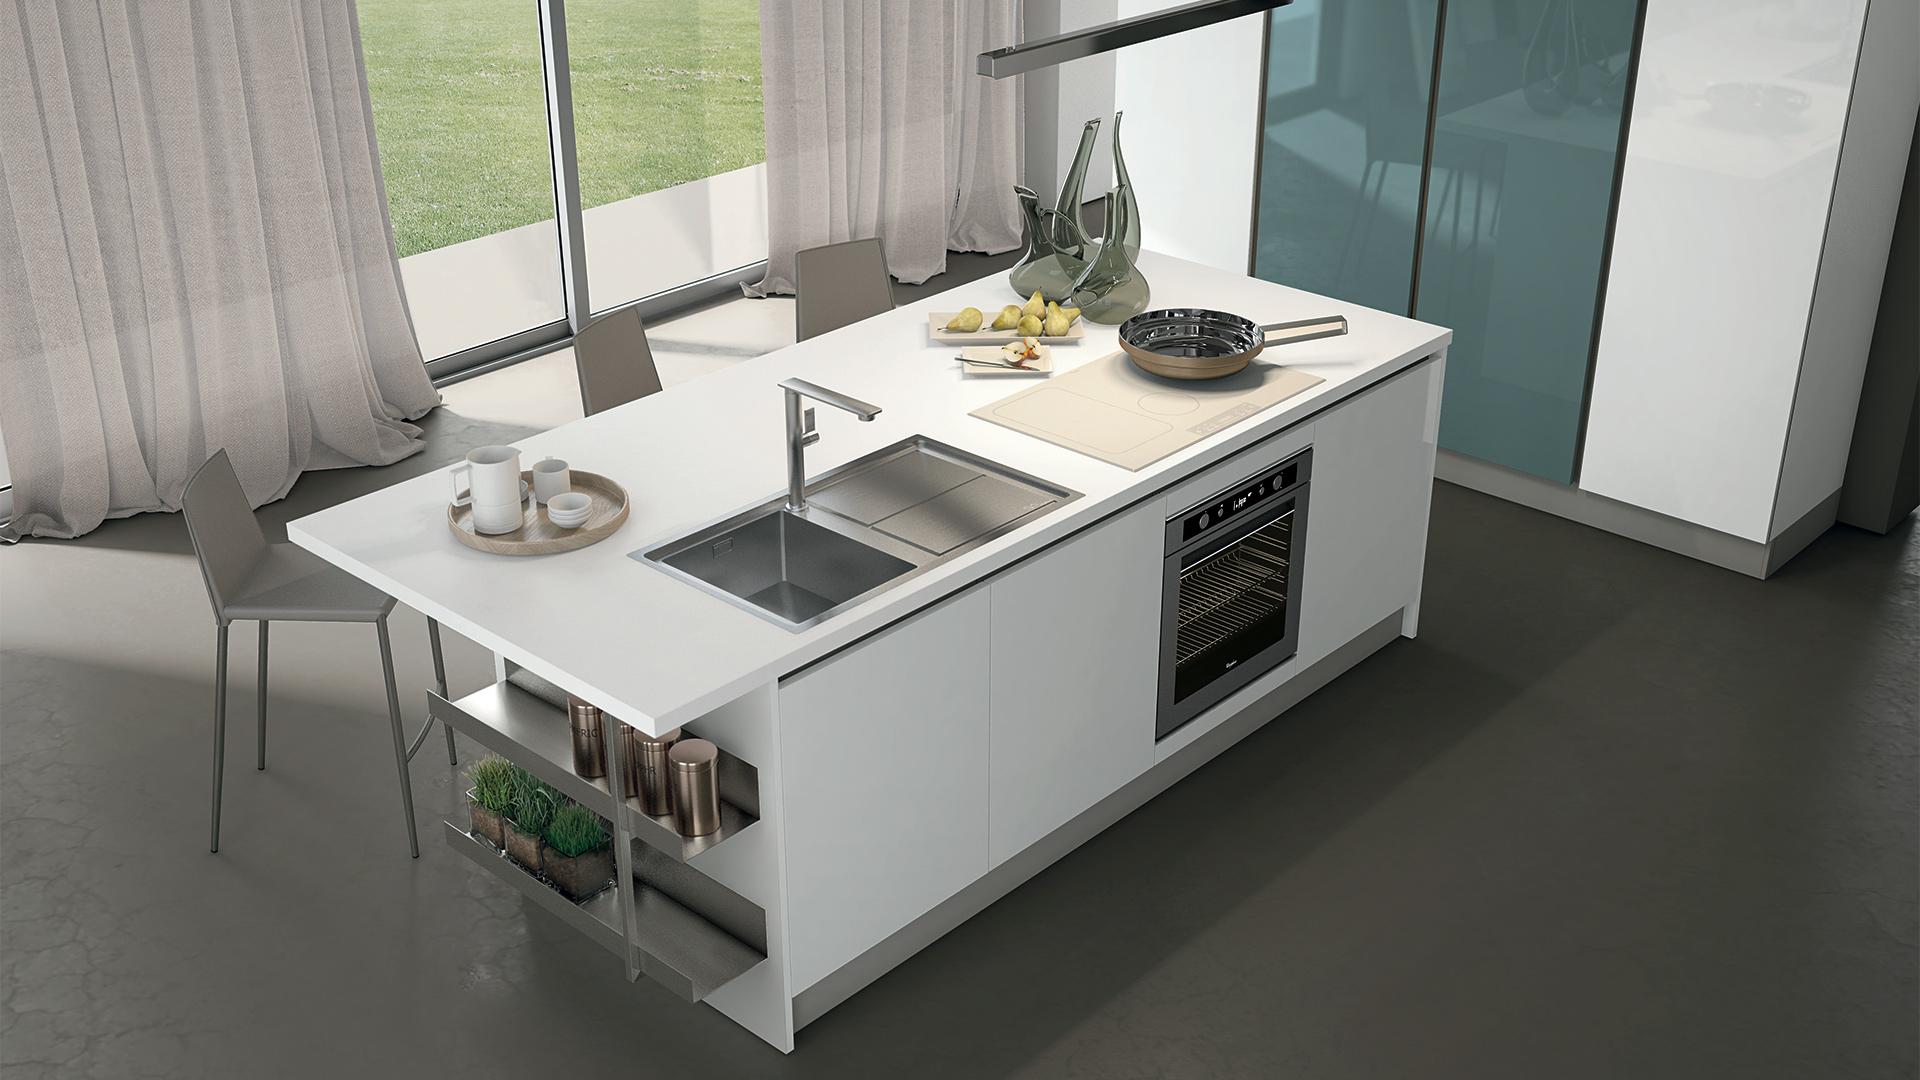 Cucina A Ferro Di Cavallo. Elegant Cucine A Ferro Di Cavallo Moderne ...